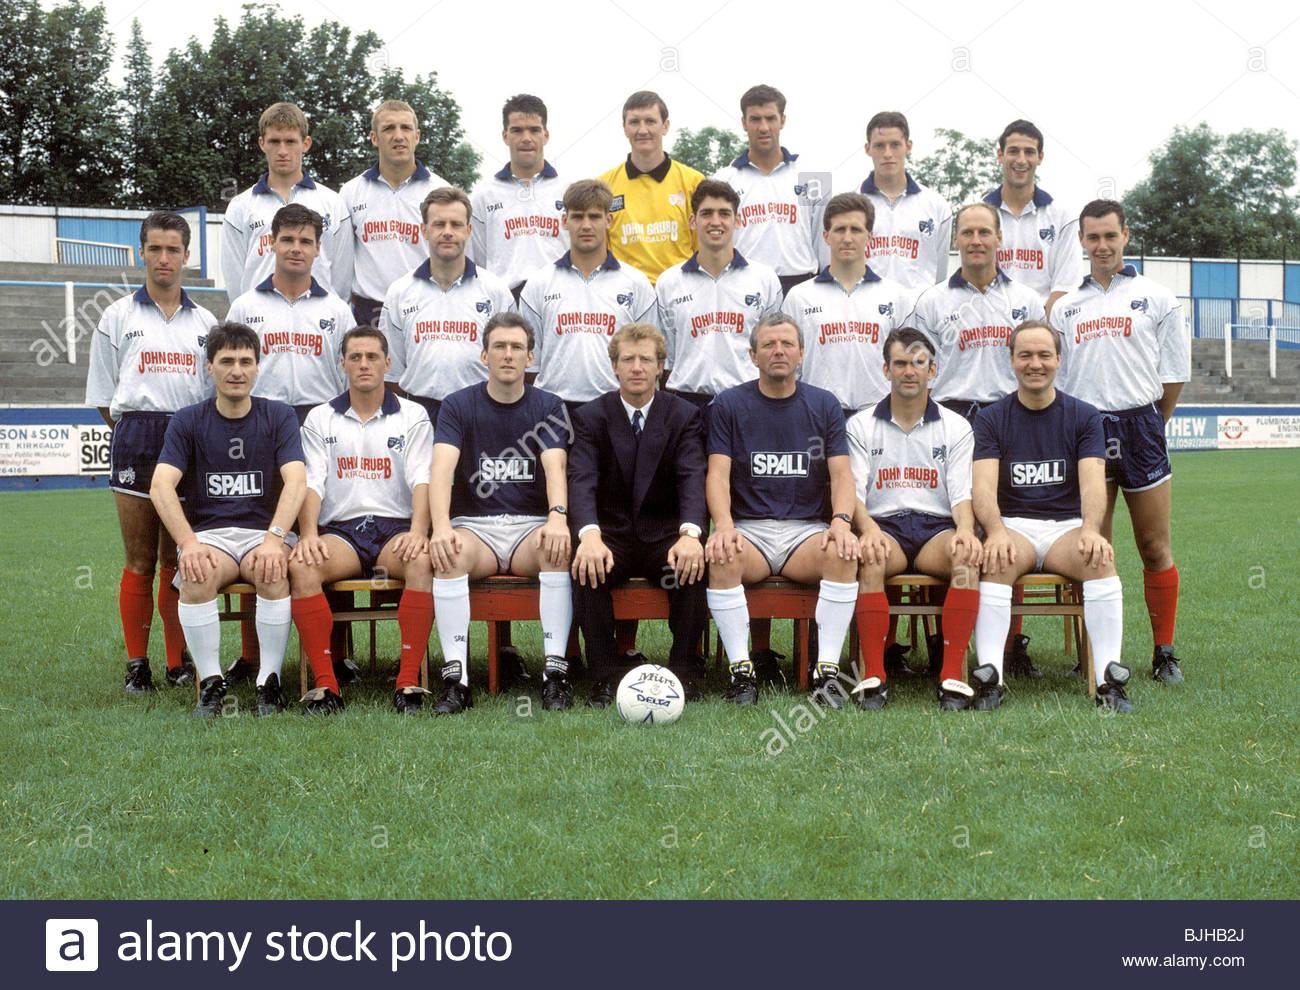 SEASON 1992/1993 RAITH ROVERS Raith Rovers team picture - Stock Image